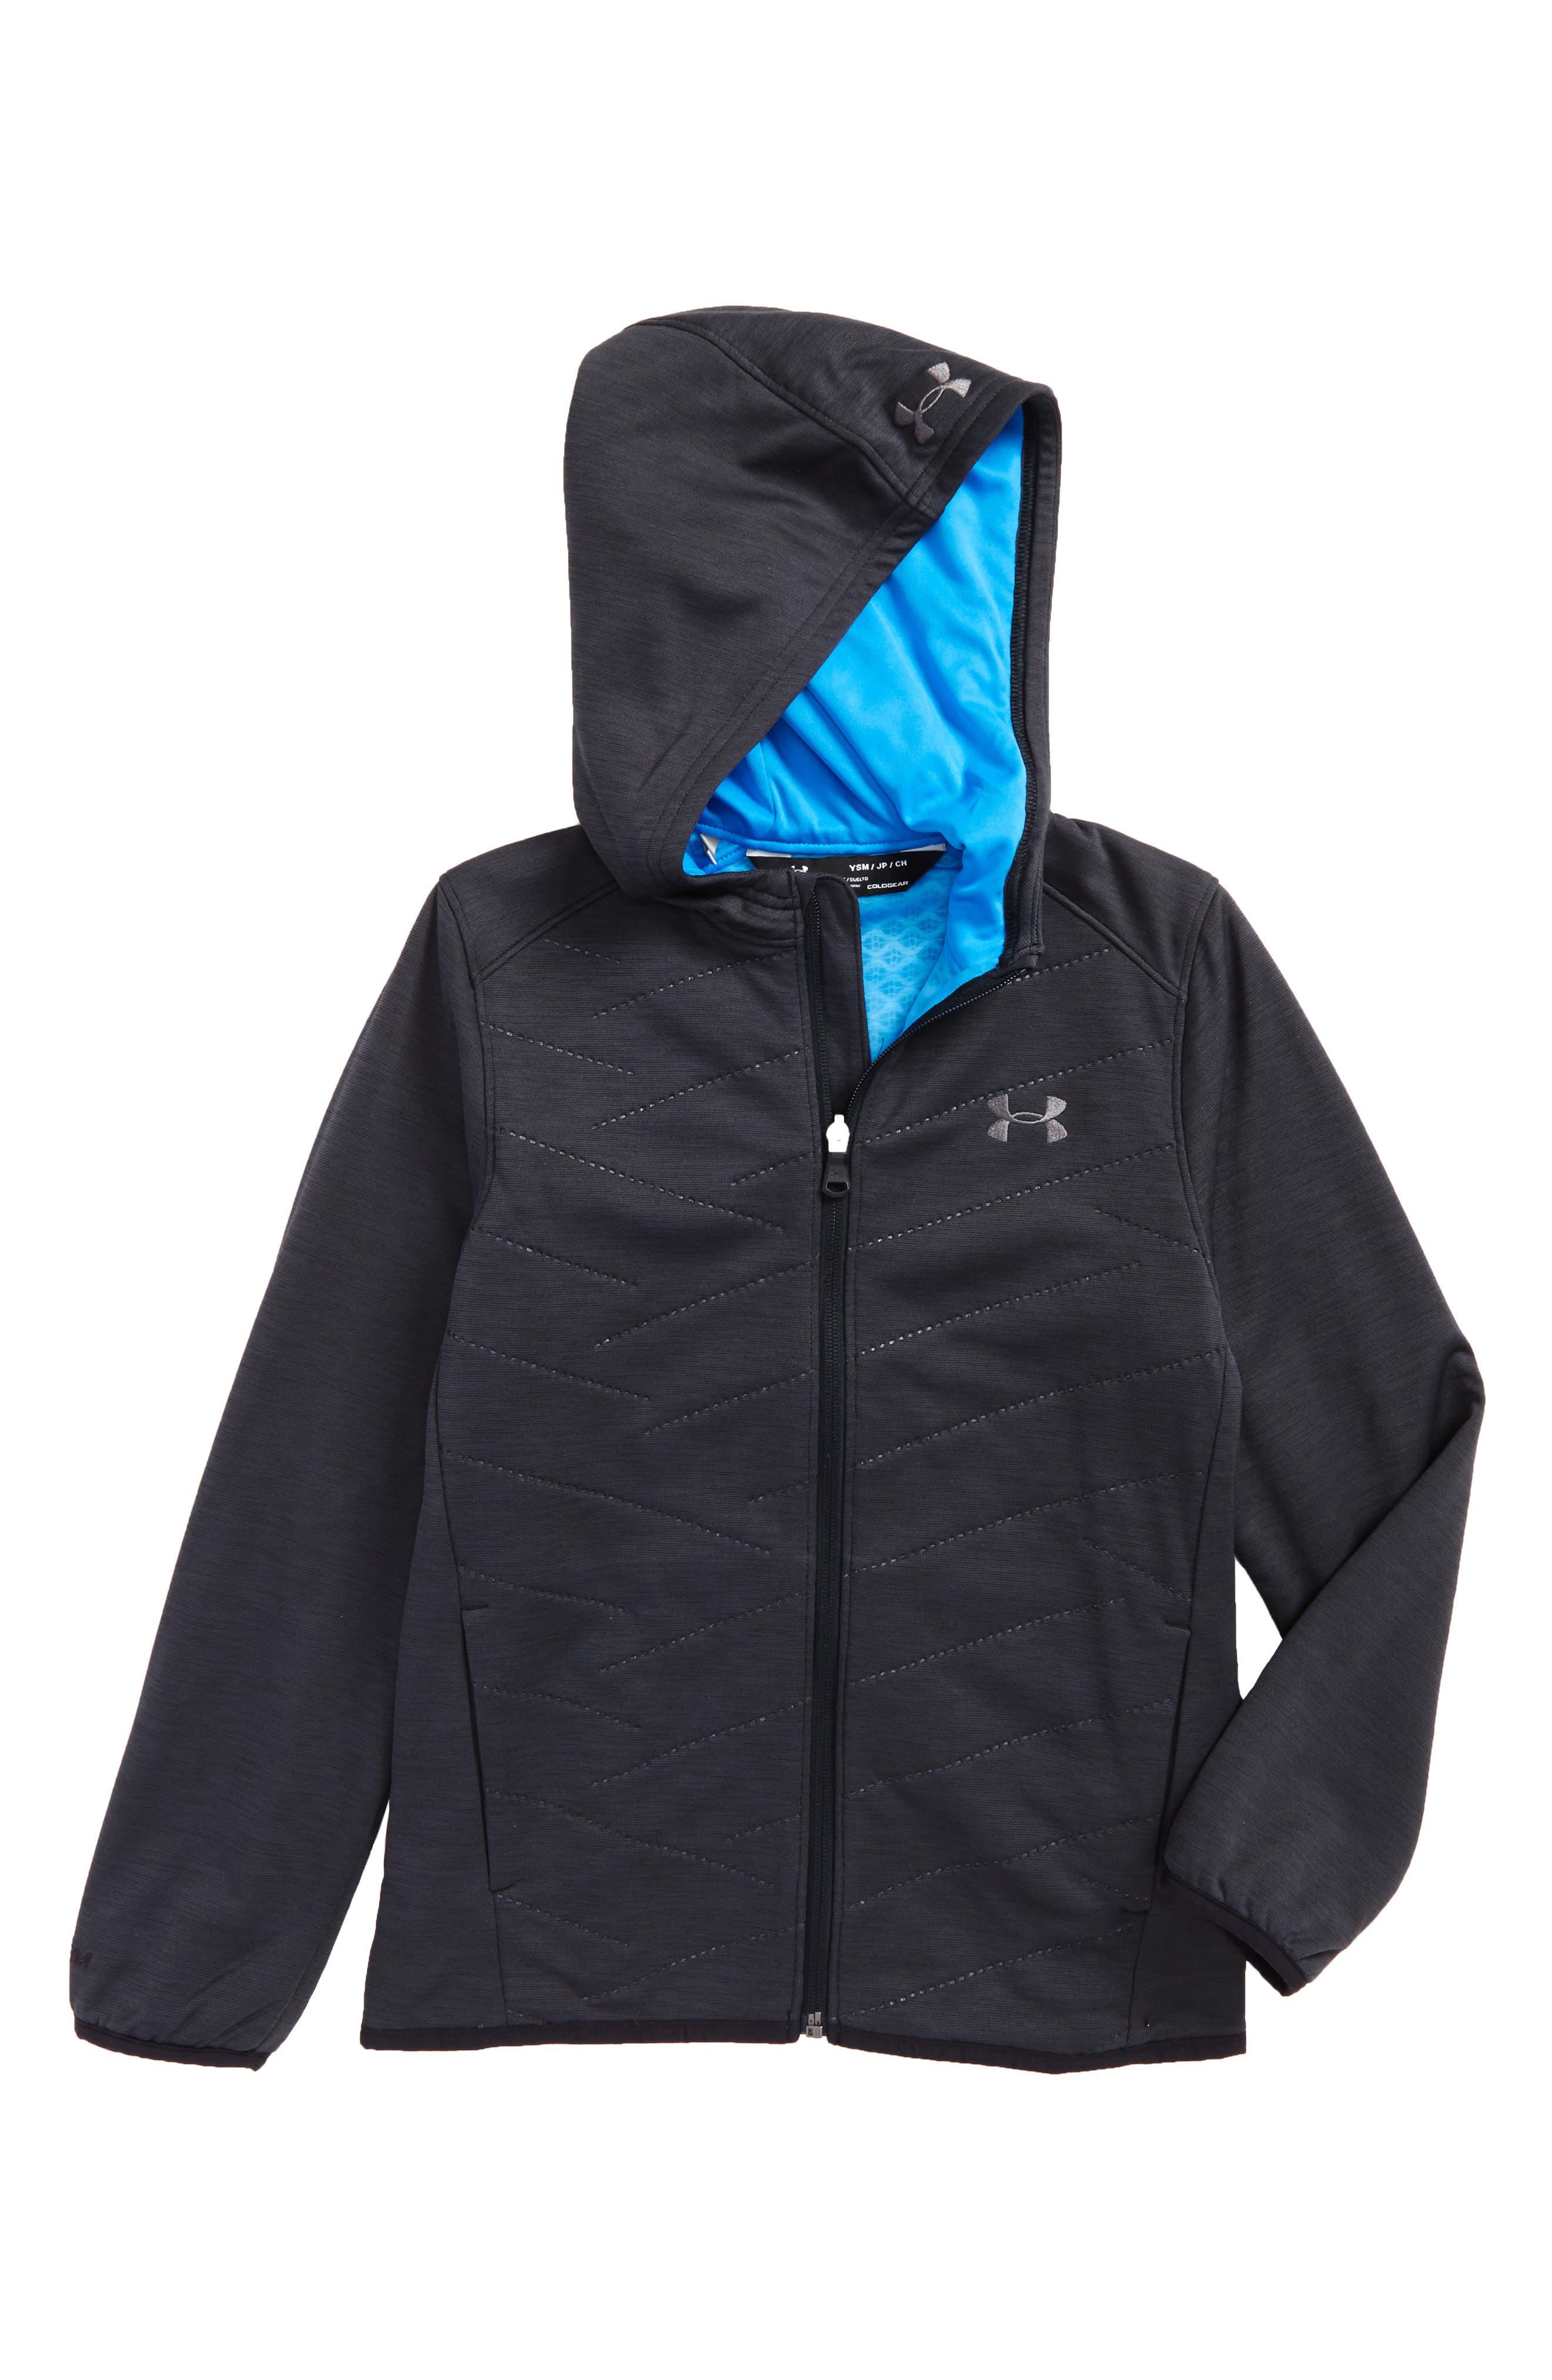 ColdGear<sup>®</sup> Reactor Hybrid Hooded Jacket,                             Main thumbnail 1, color,